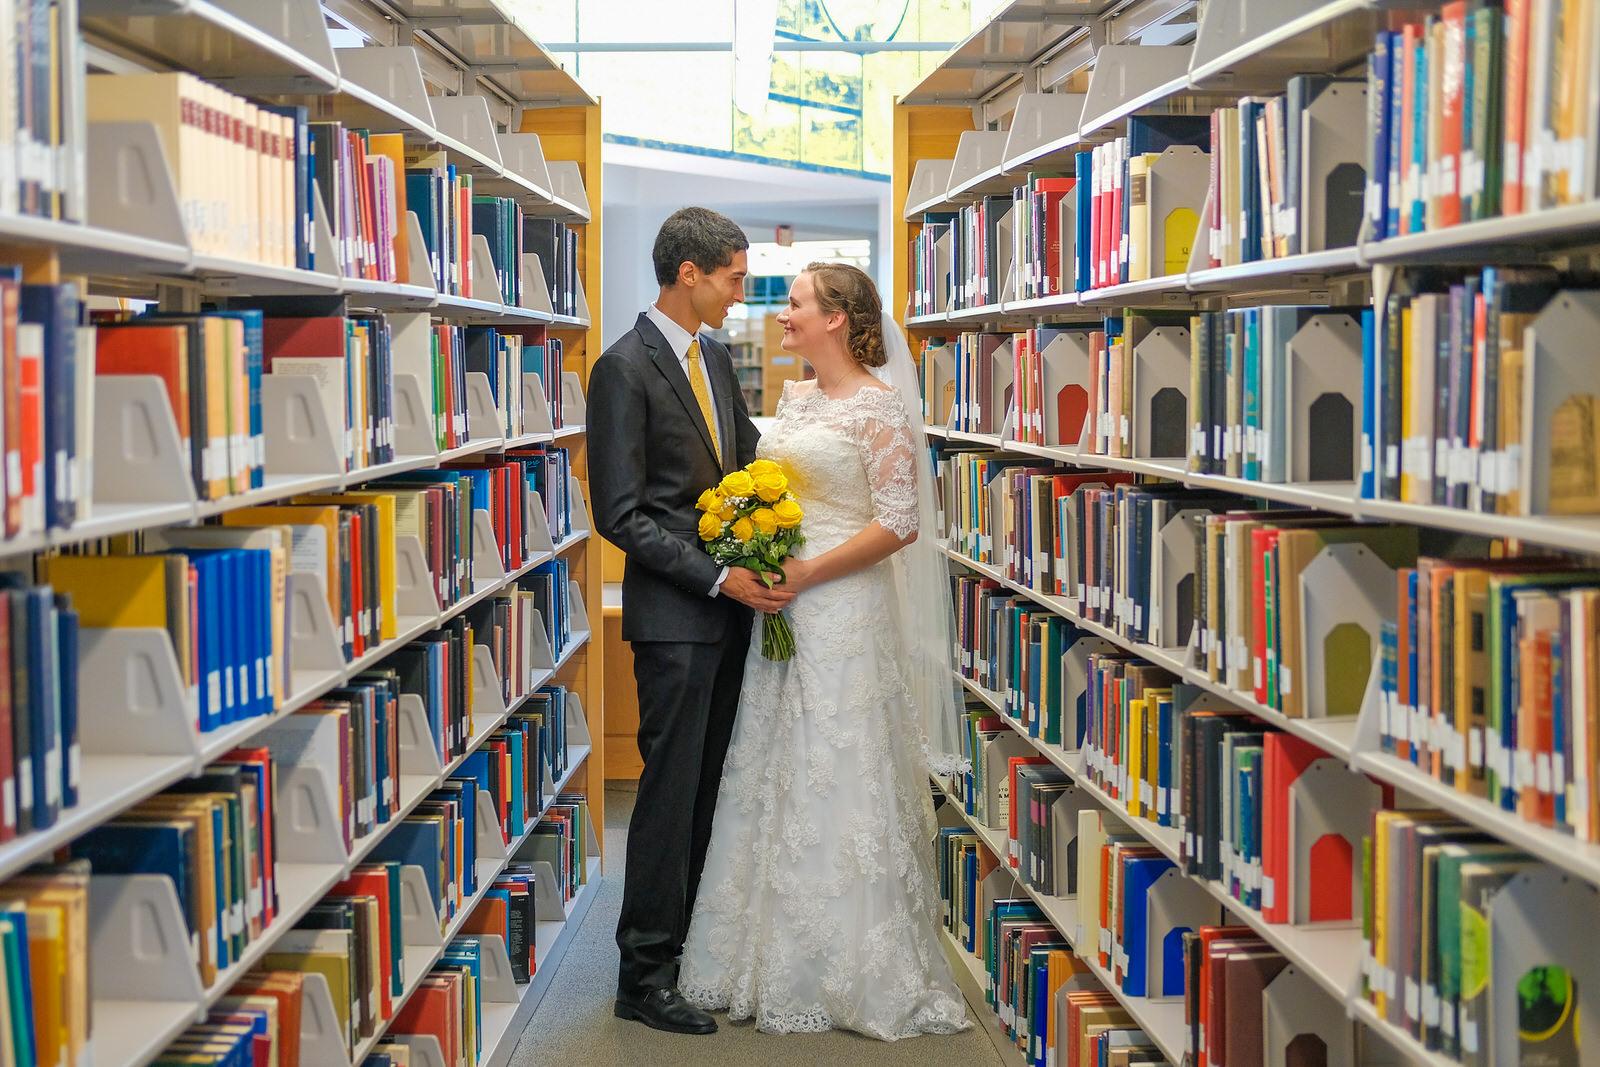 candid-vermont-wedding-photography-946.jpg